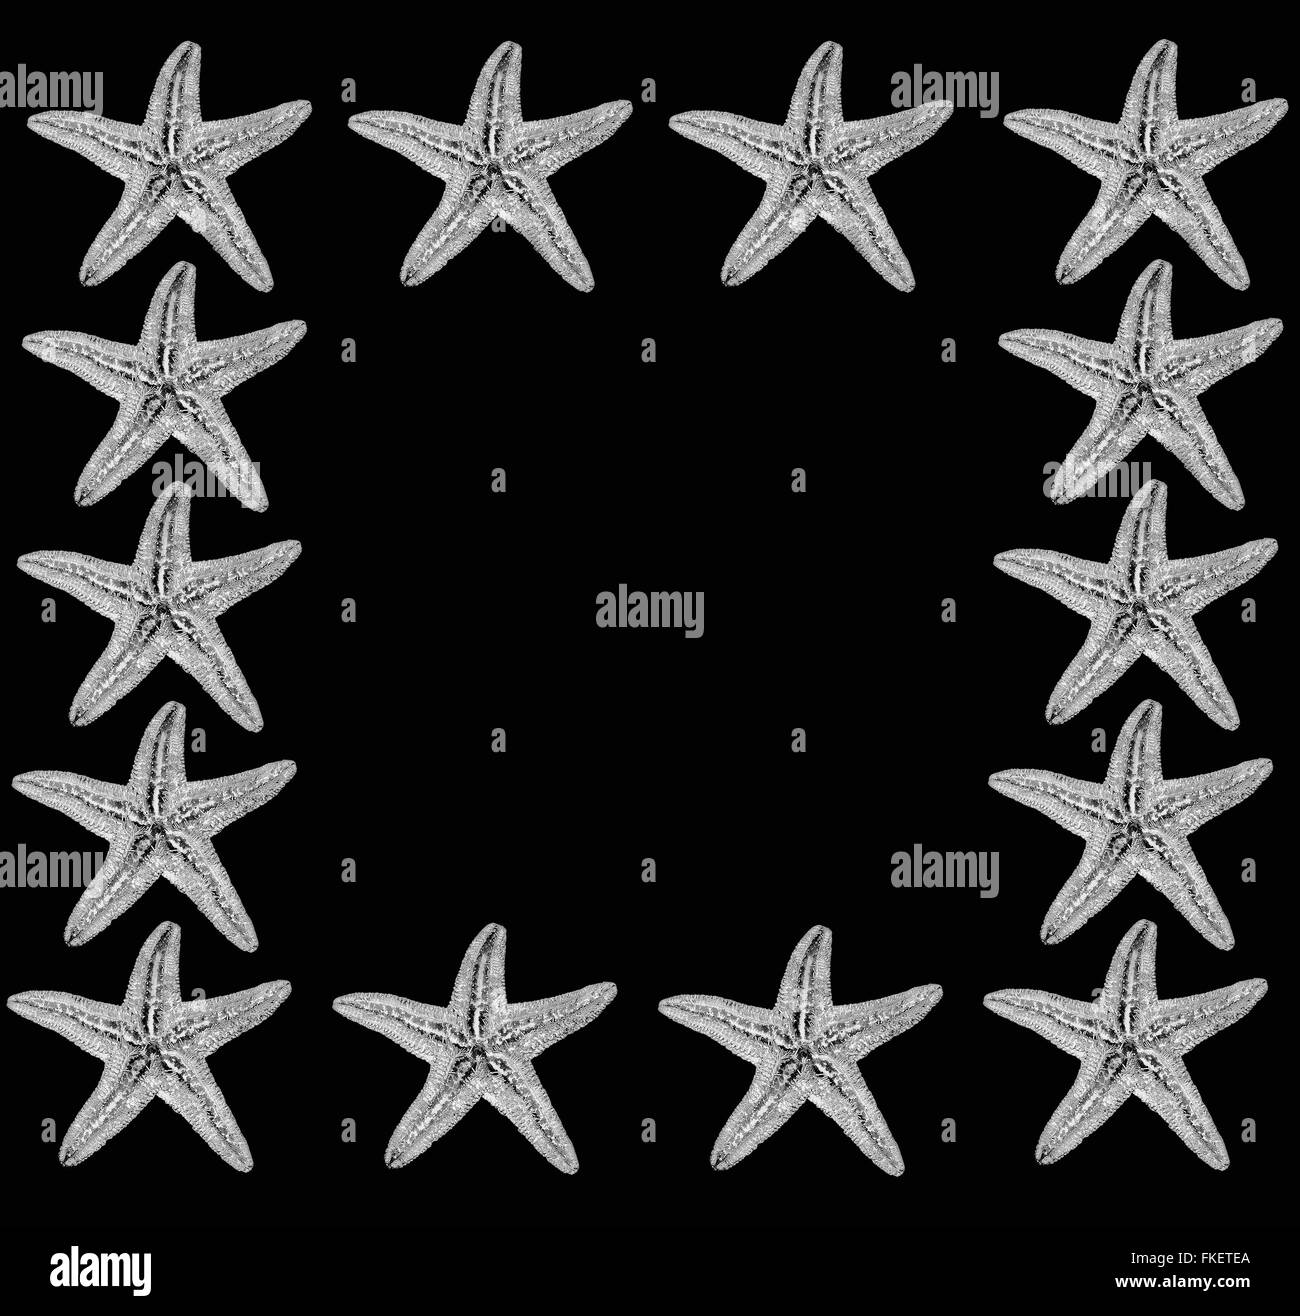 sea stars background - Stock Image